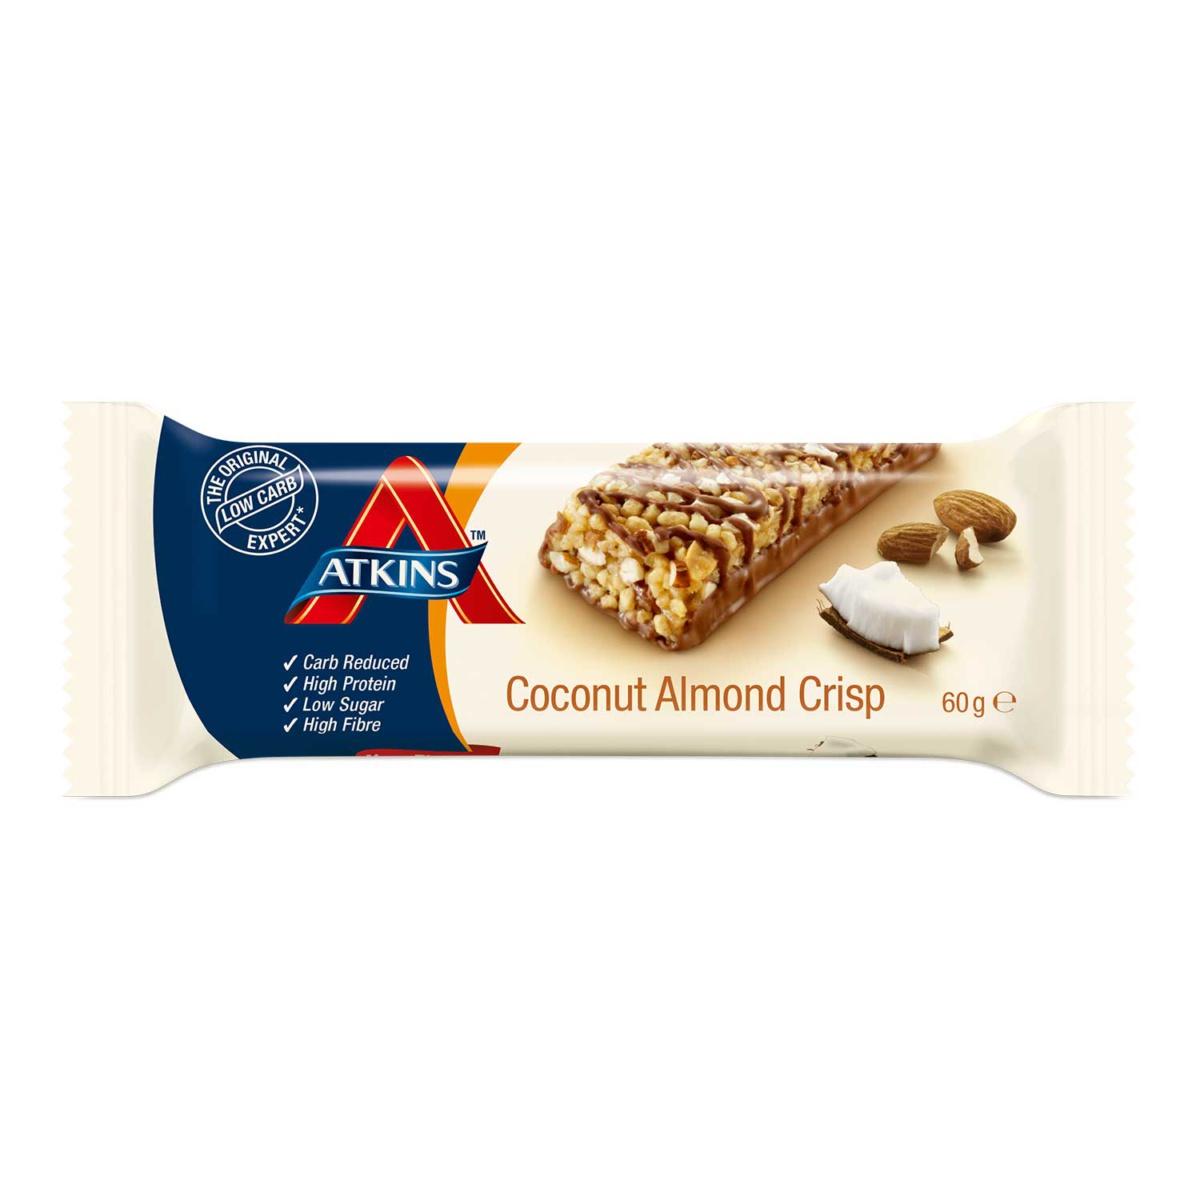 atkins-coconut-almond-crisp-bar